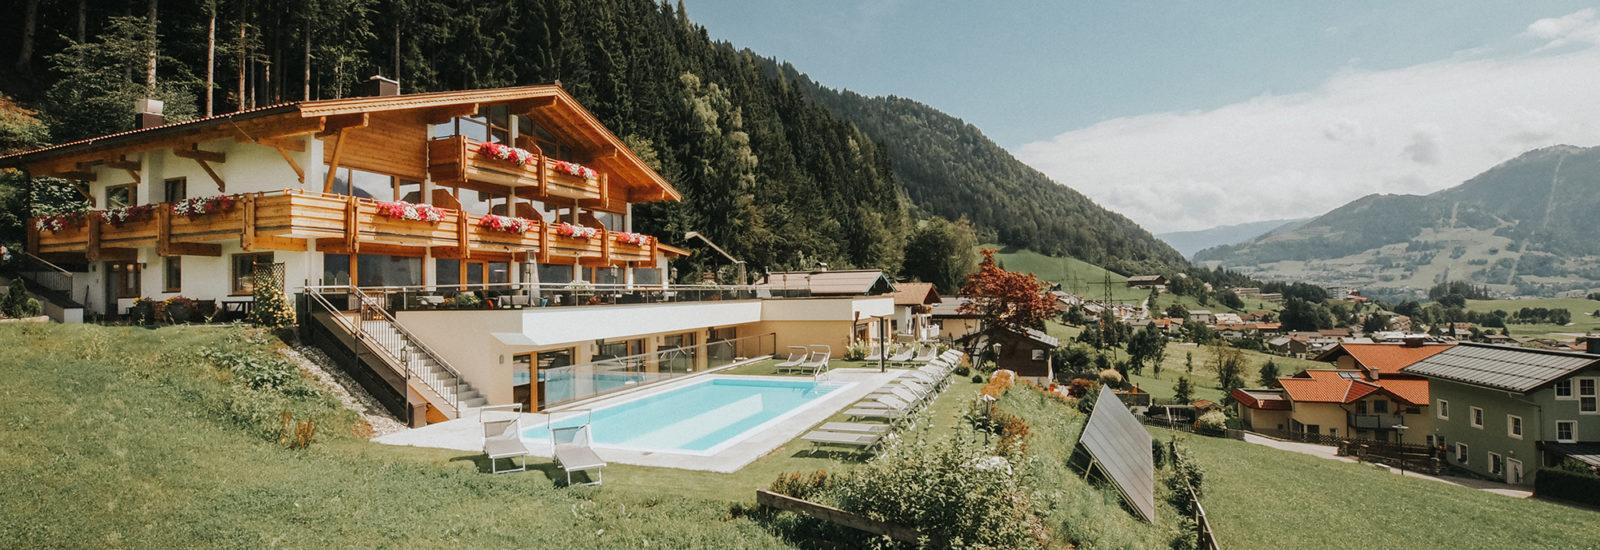 Hotel Silberfux St. Veit Pongau